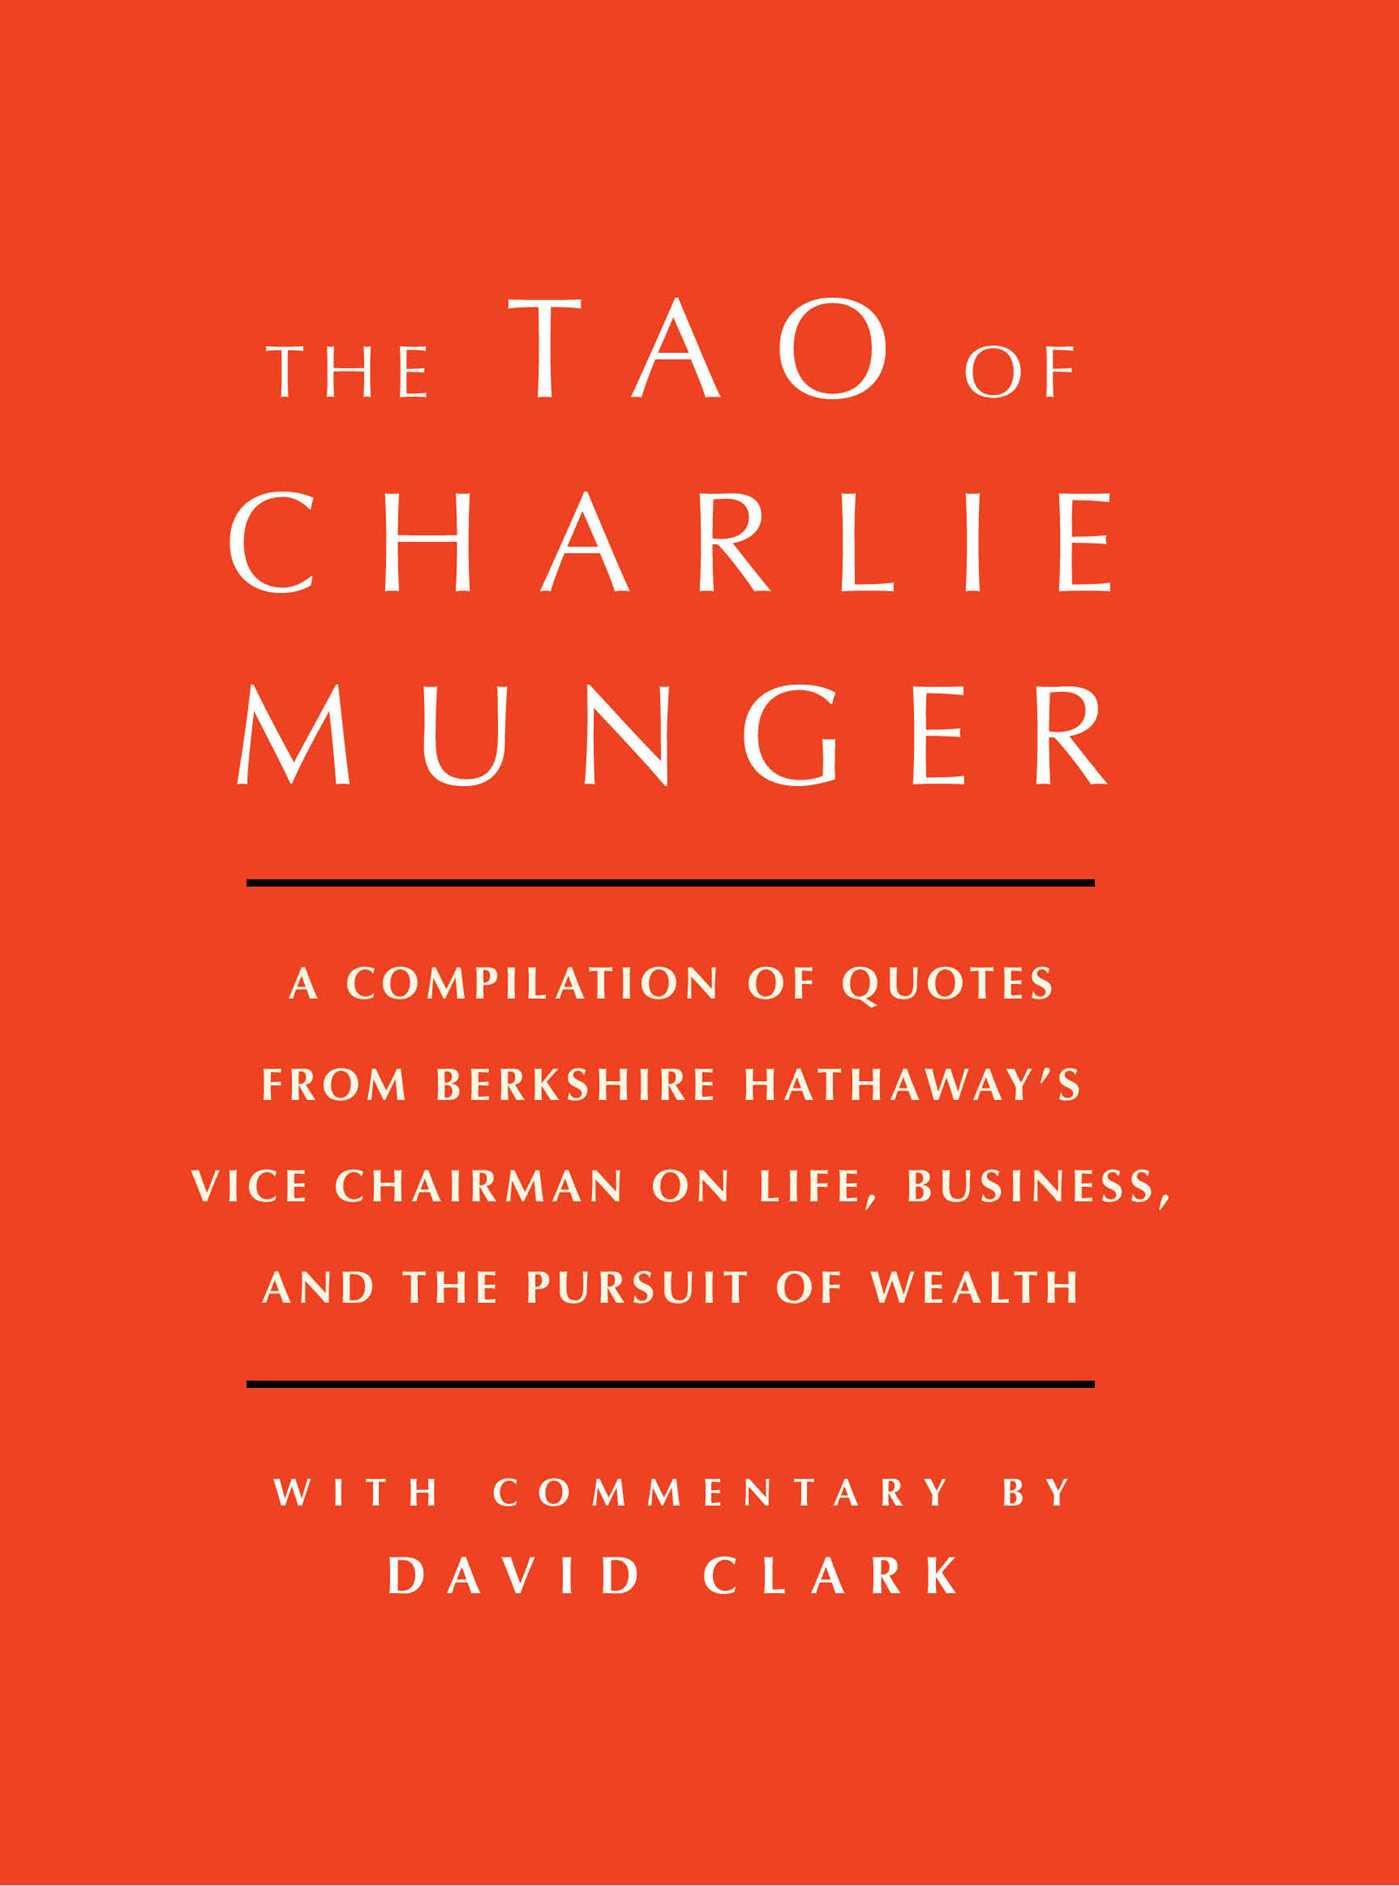 Tao of charlie munger 9781501153358 hr